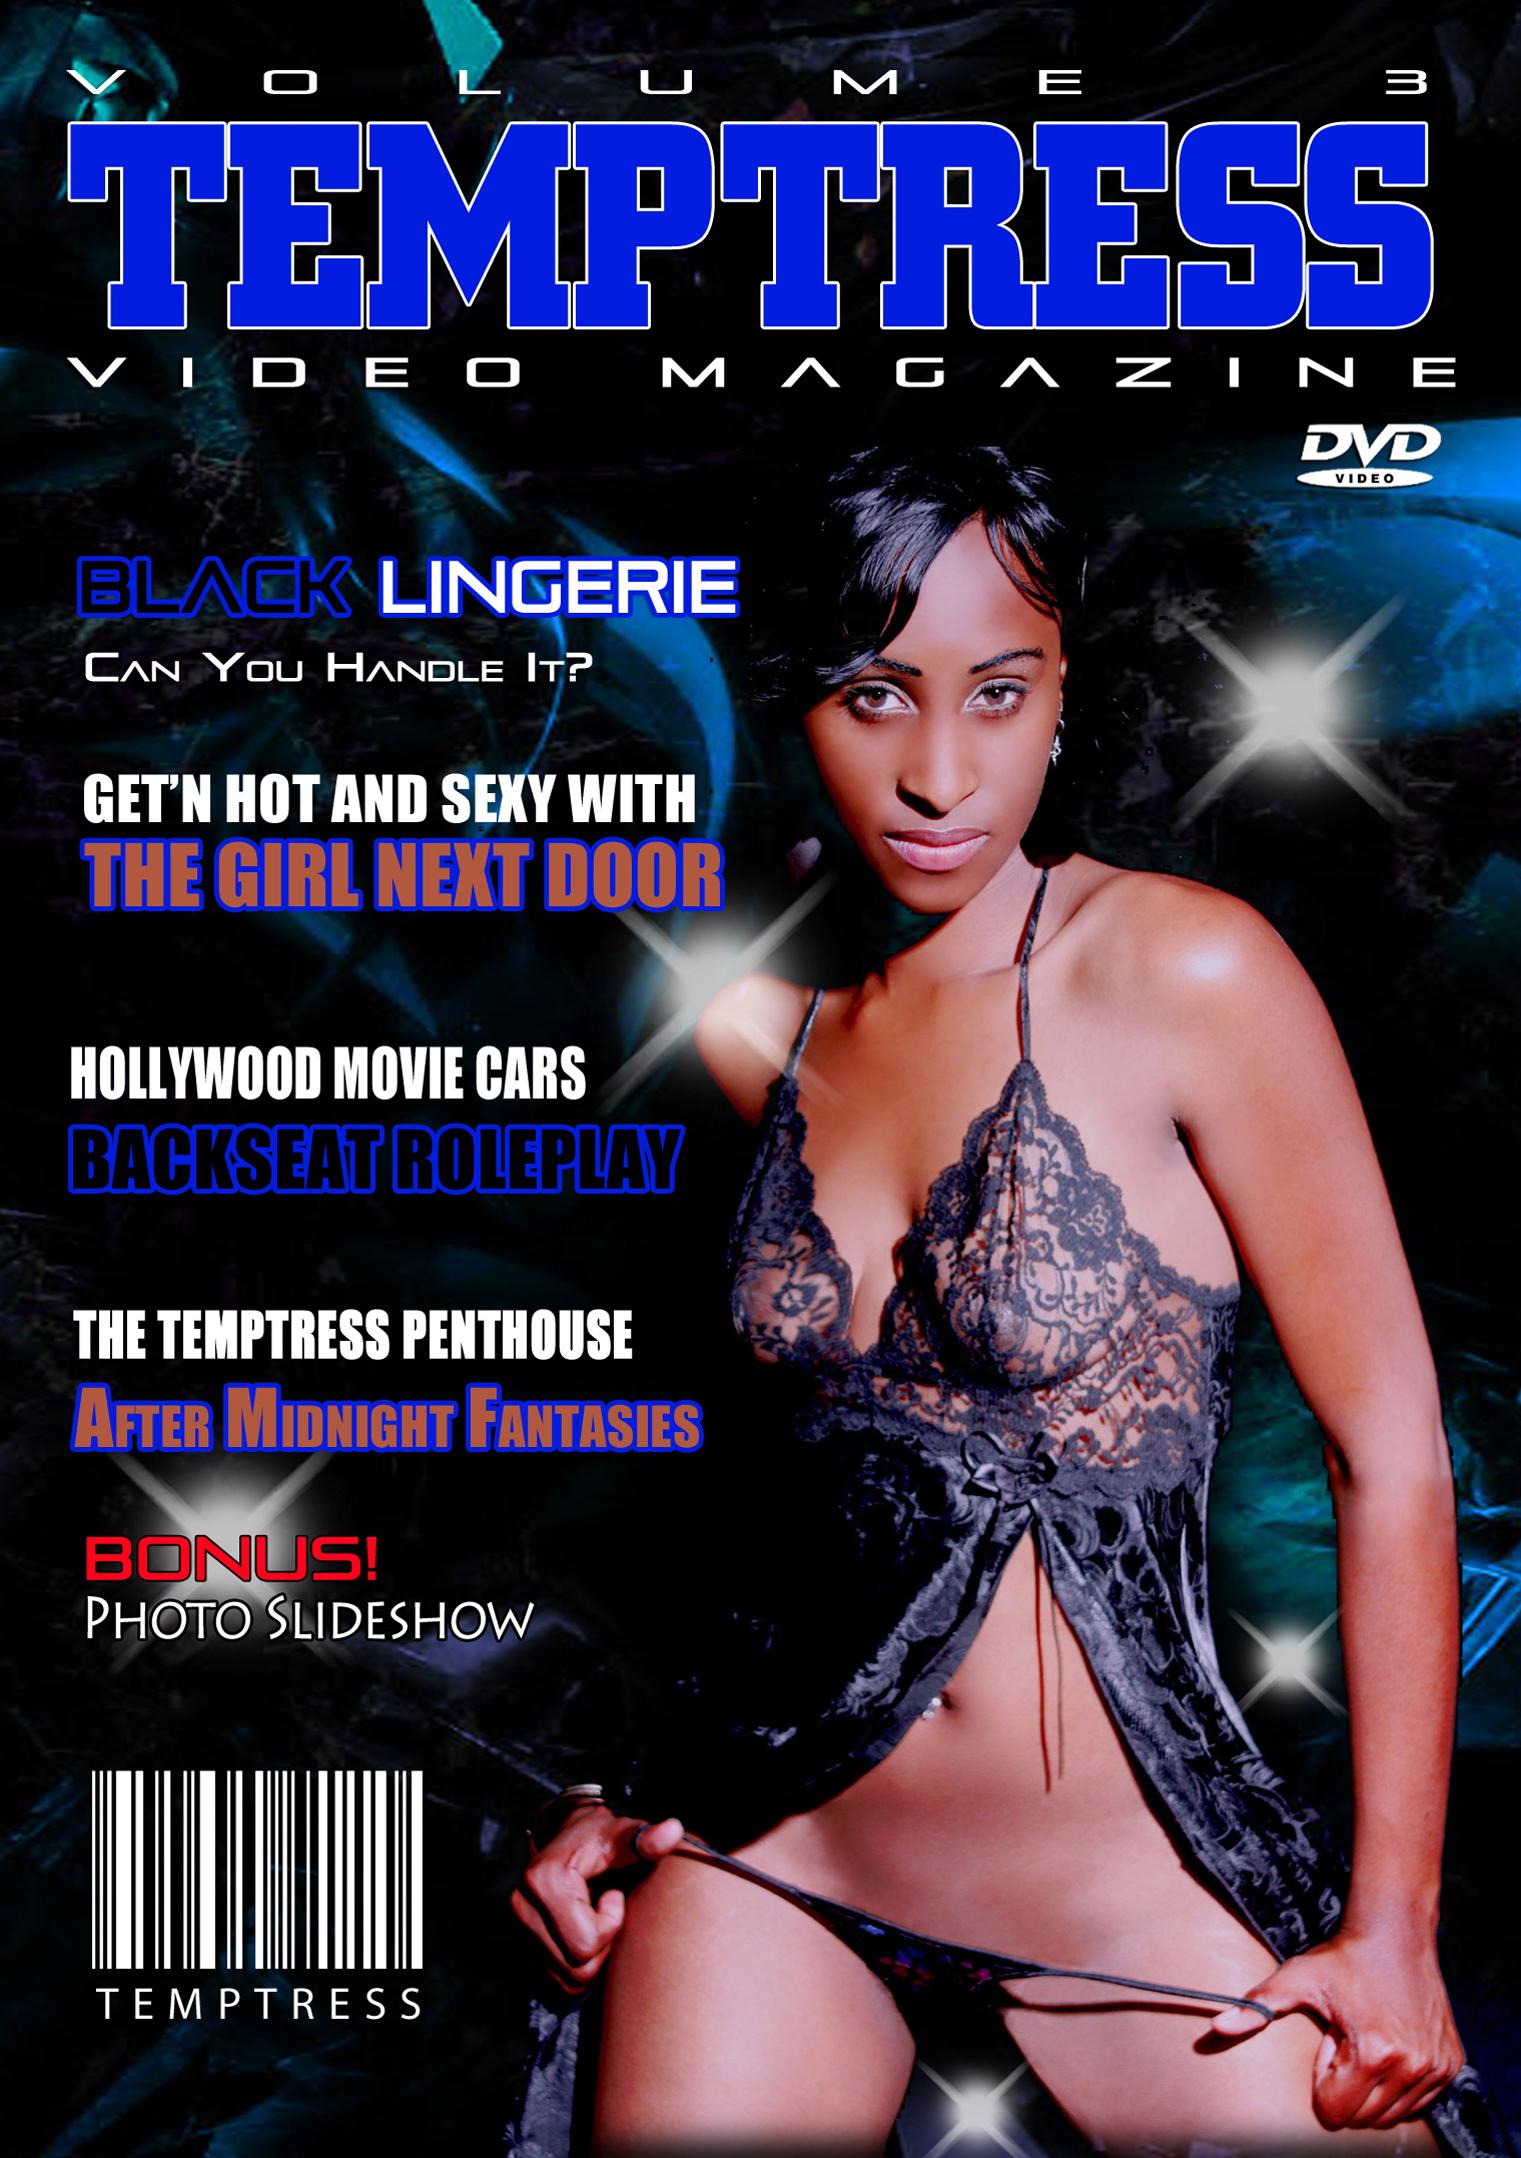 Temptress Video Magazine, Vol. 3